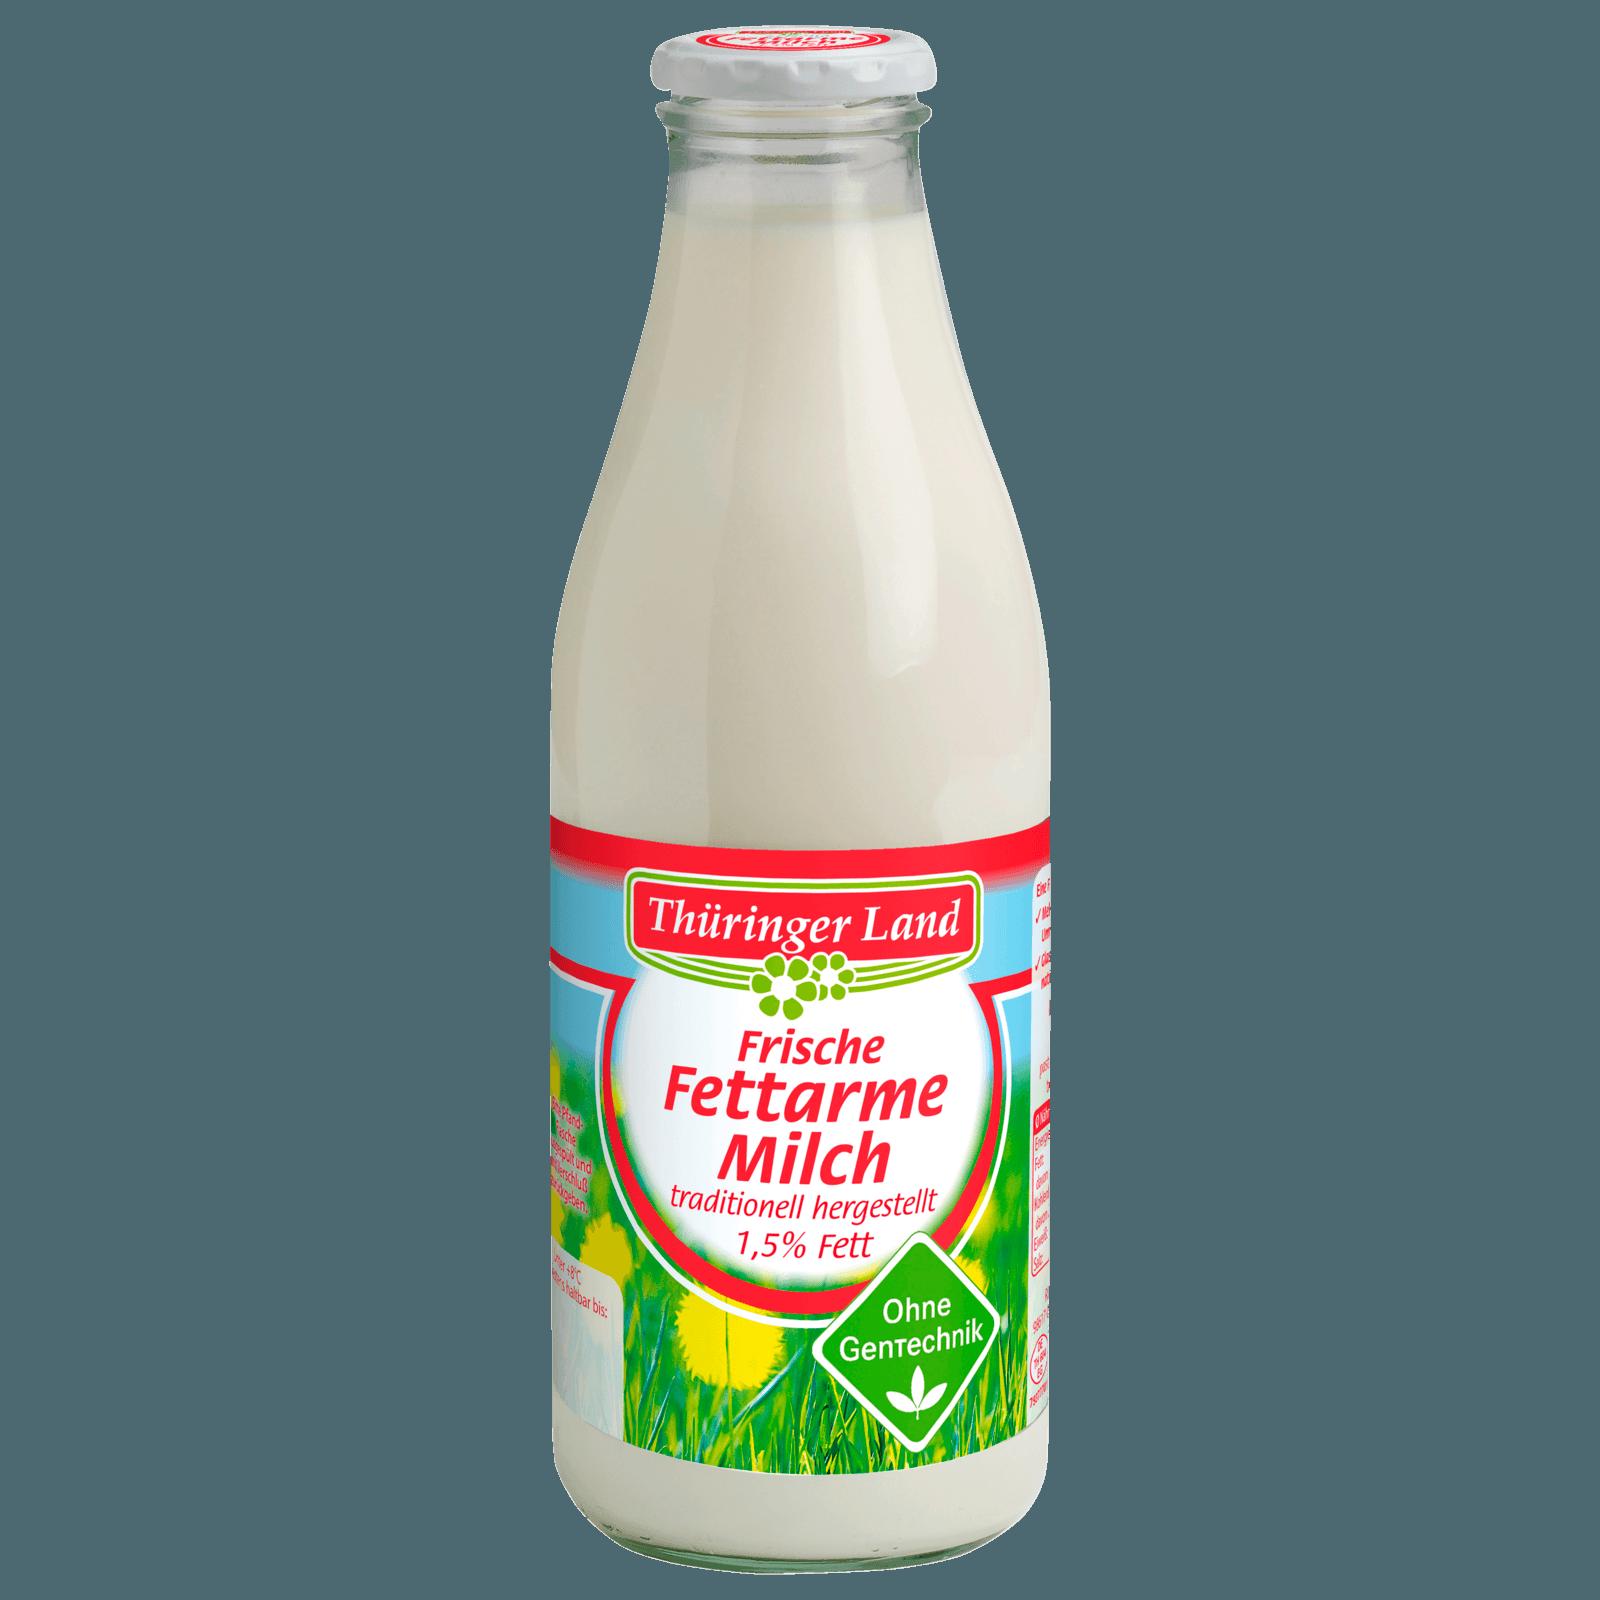 Thüringer Land Frische Fettarme Milch 1,5% 1l